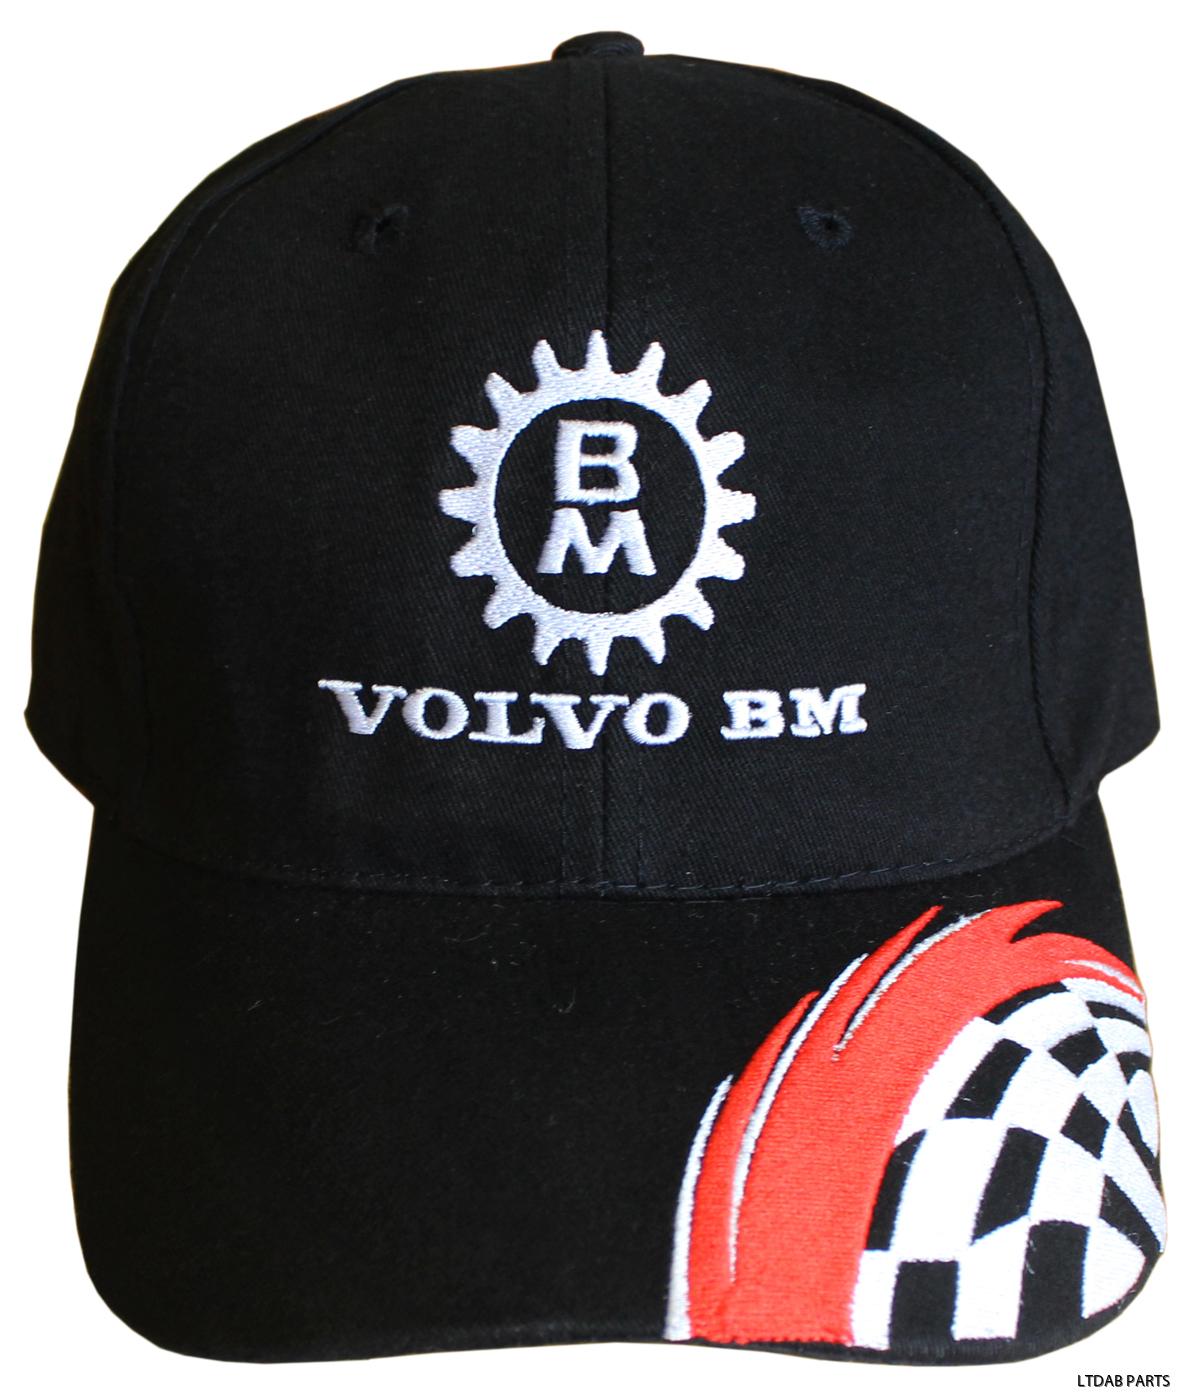 Volvo bm keps